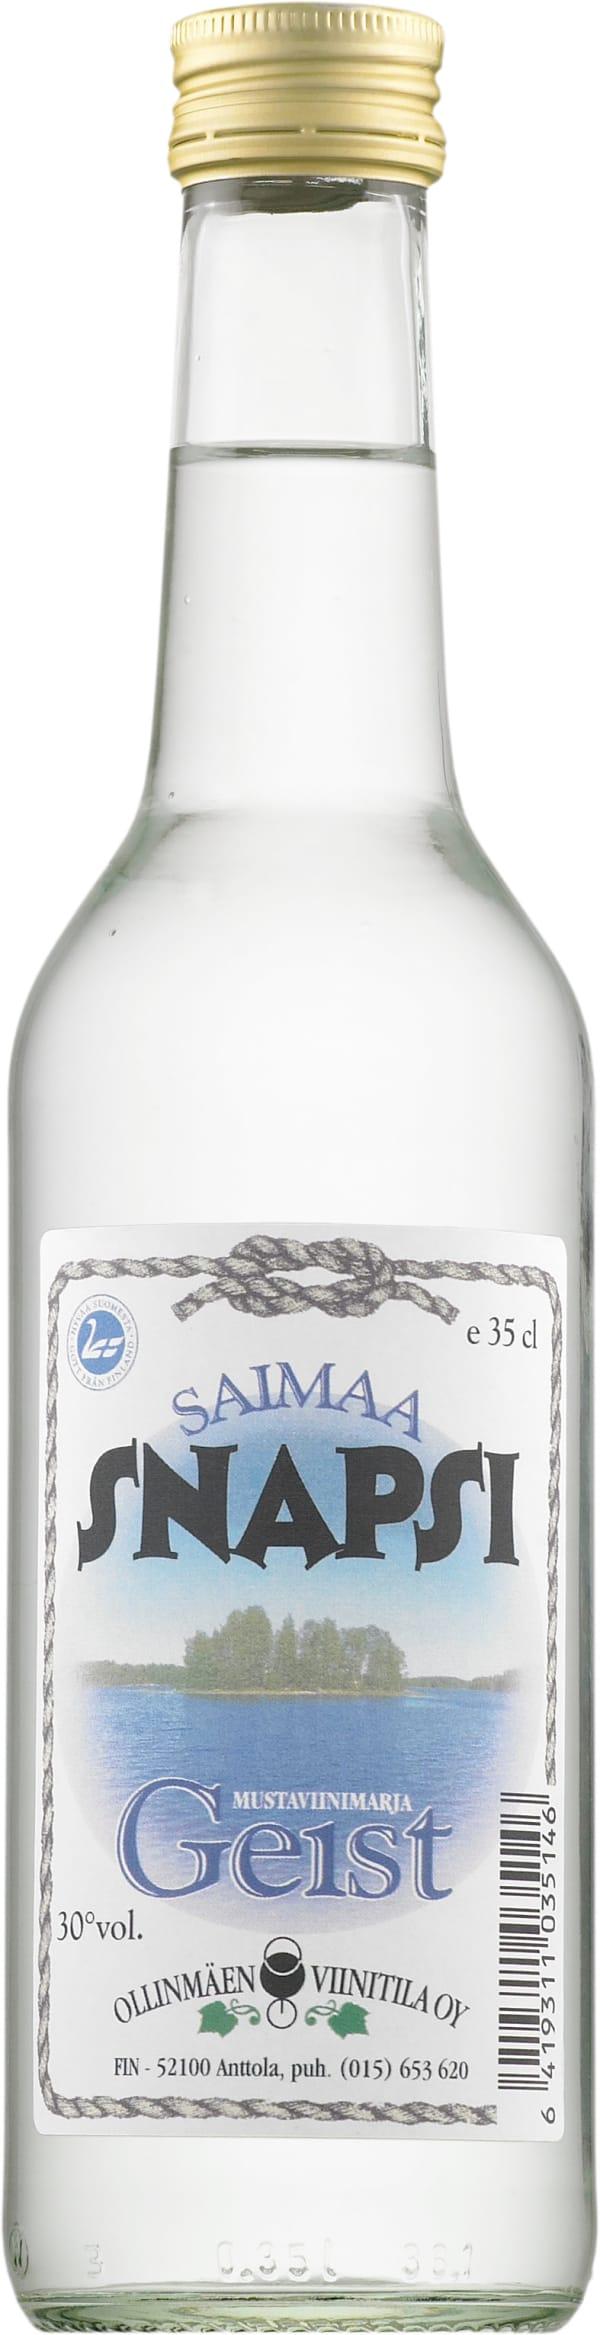 Saimaa Snapsi